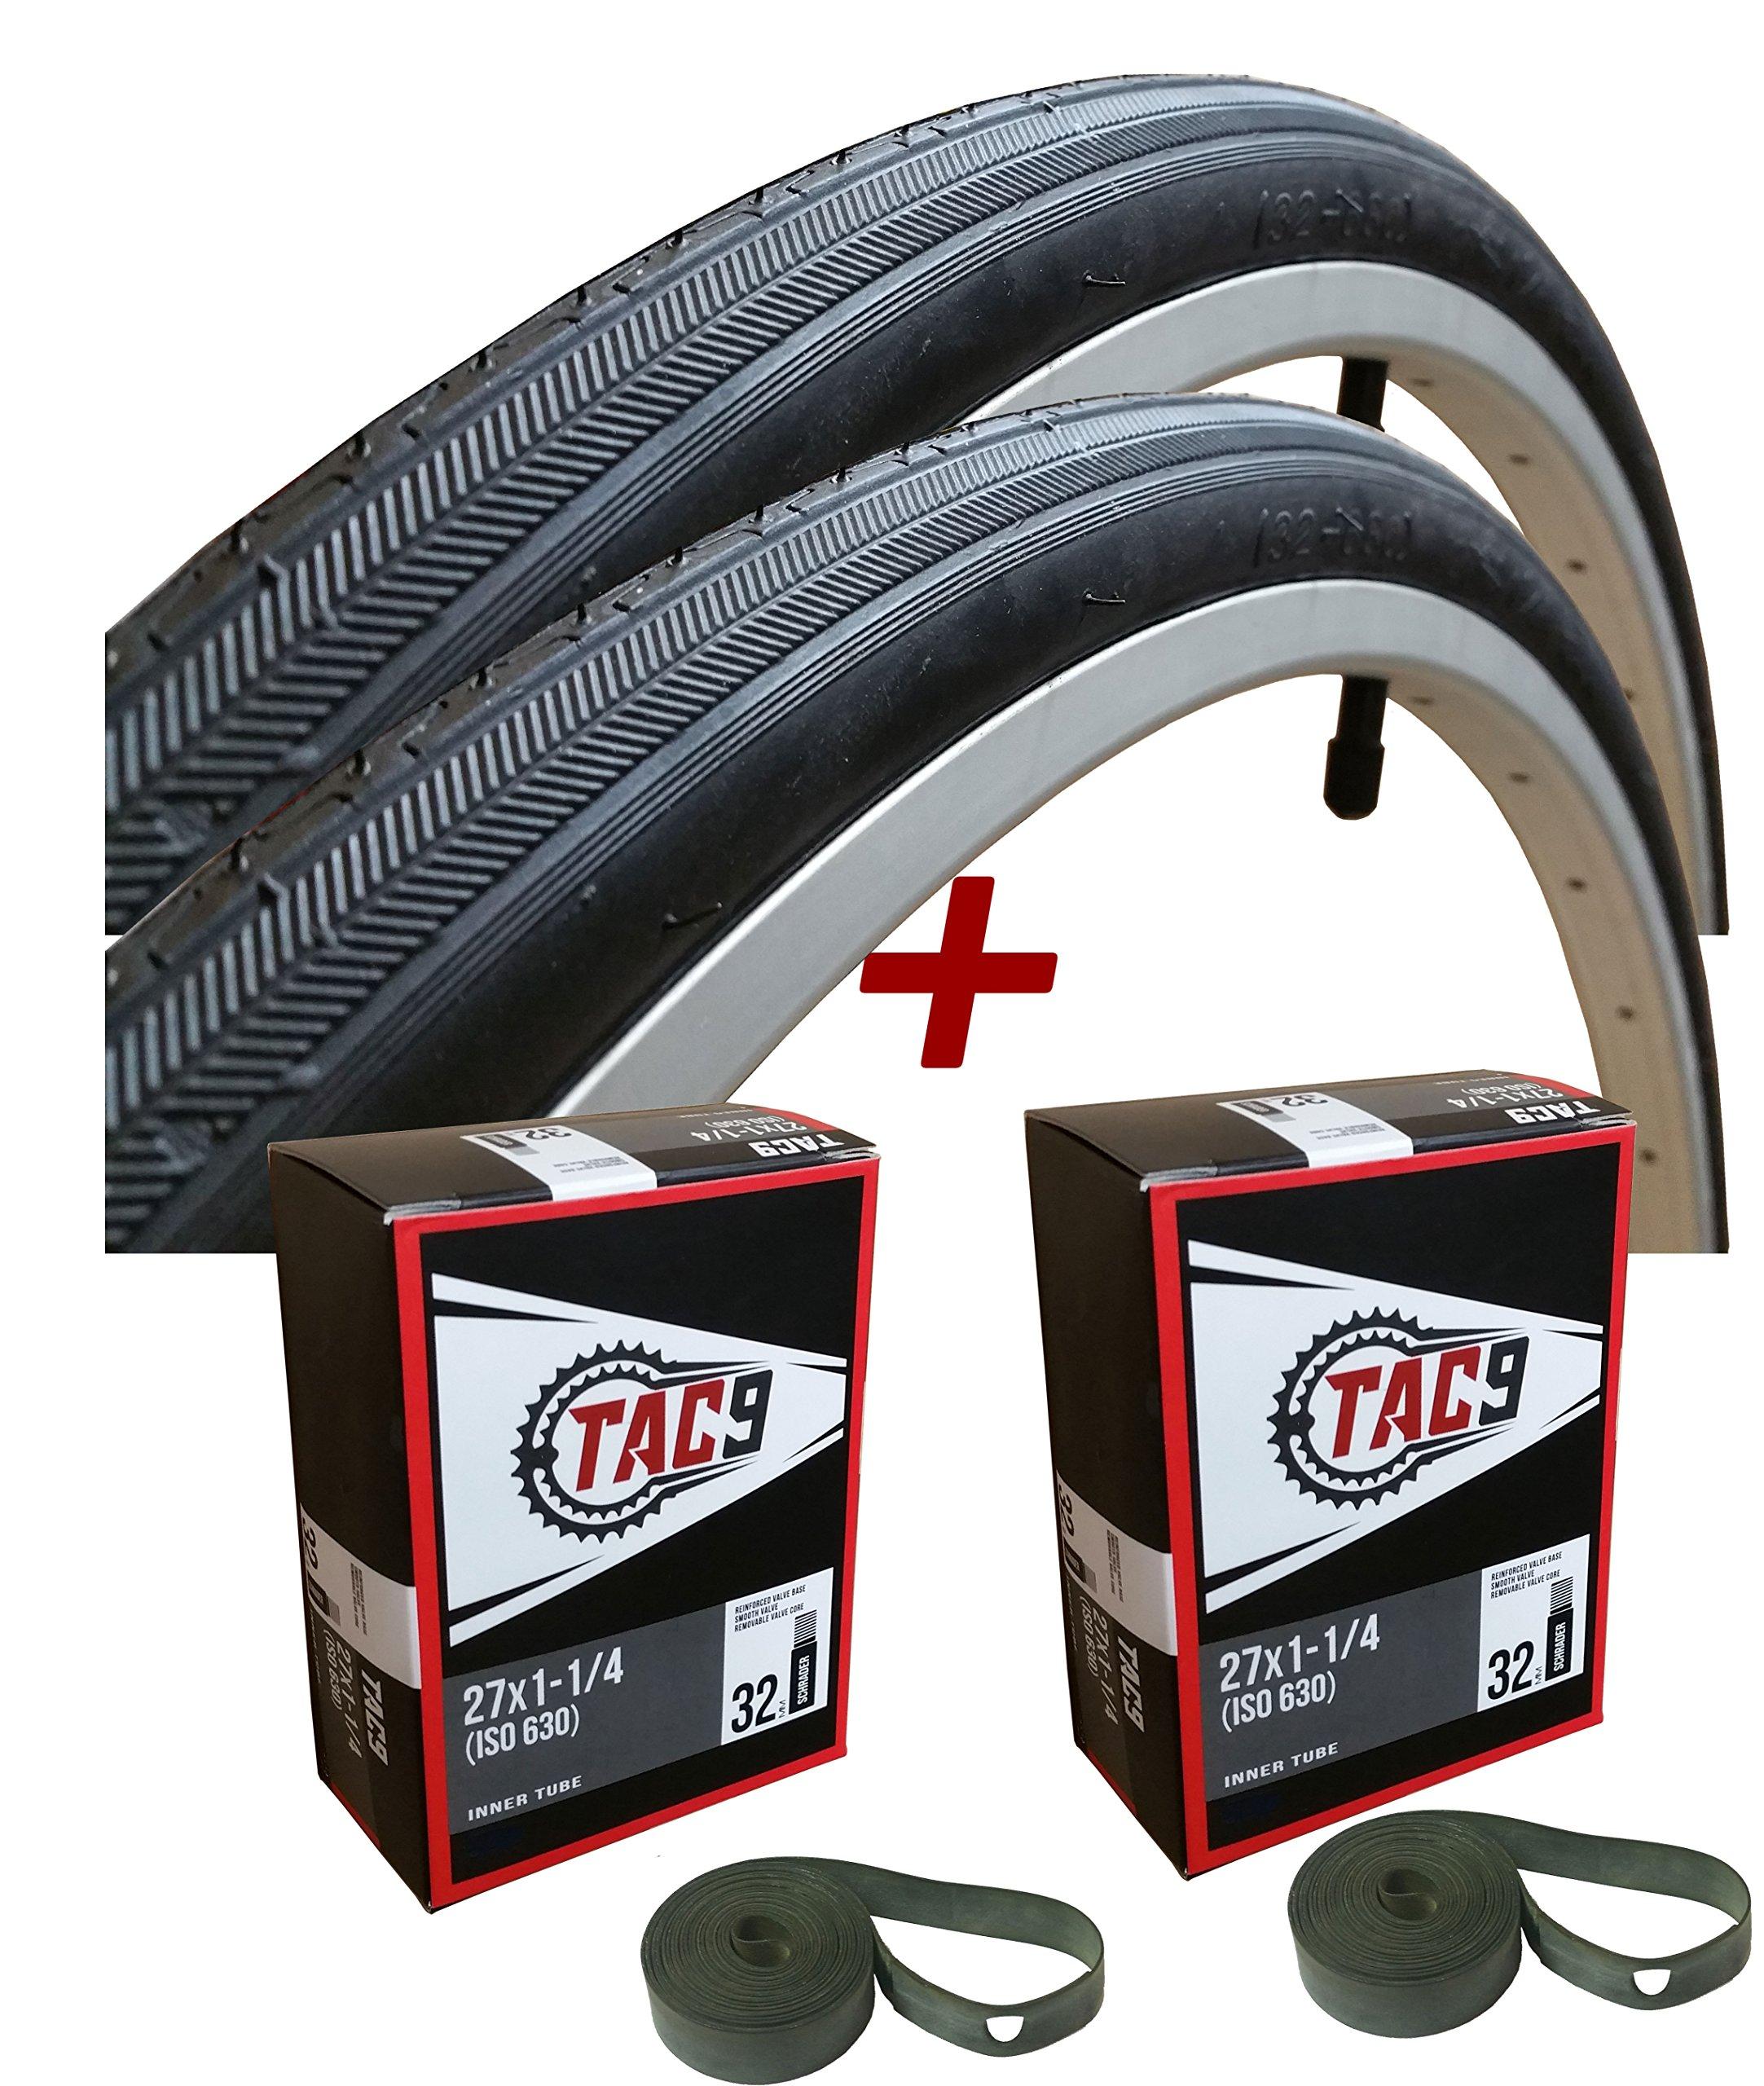 TAC 9 Two Pack - 27x1-1/4 Bike Tire, Bonus Tube and Rim Strip - Select Gum Wall or Black Wall by TAC 9